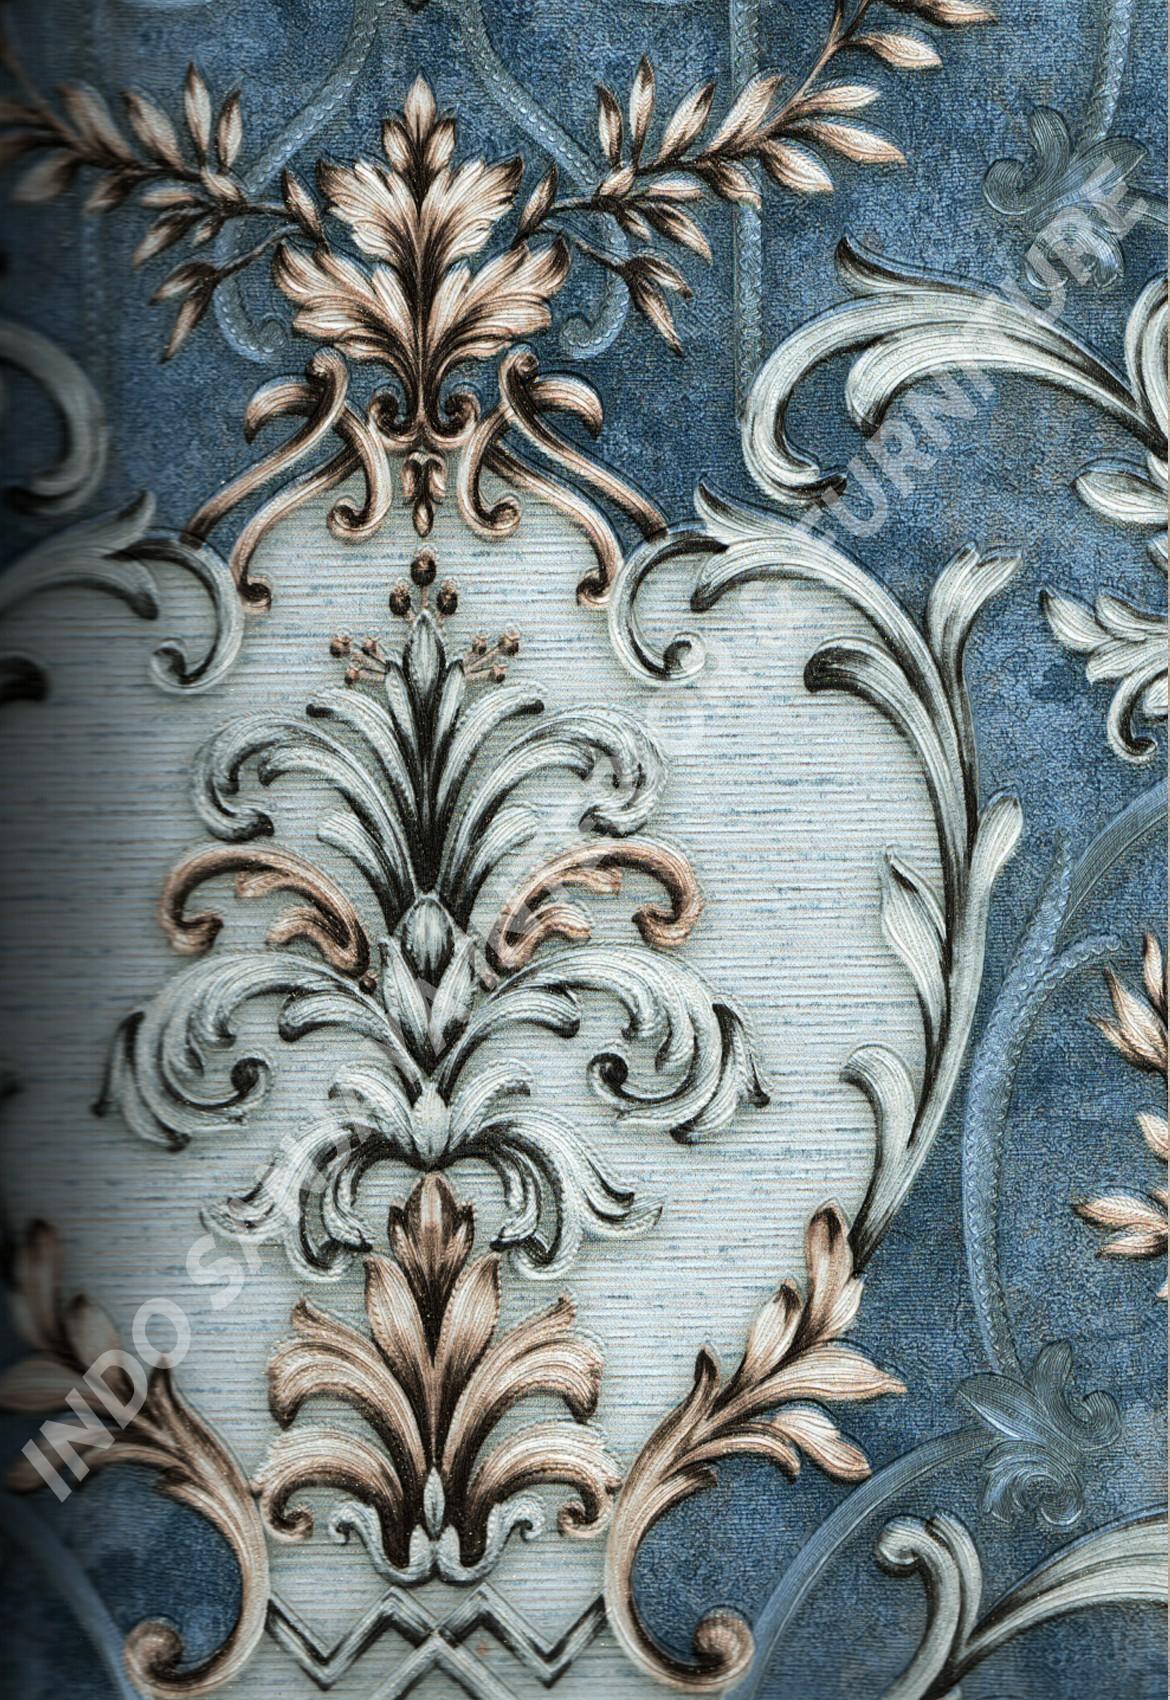 wallpaper   Wallpaper Klasik Batik (Damask) DL11006:DL11006 corak  warna